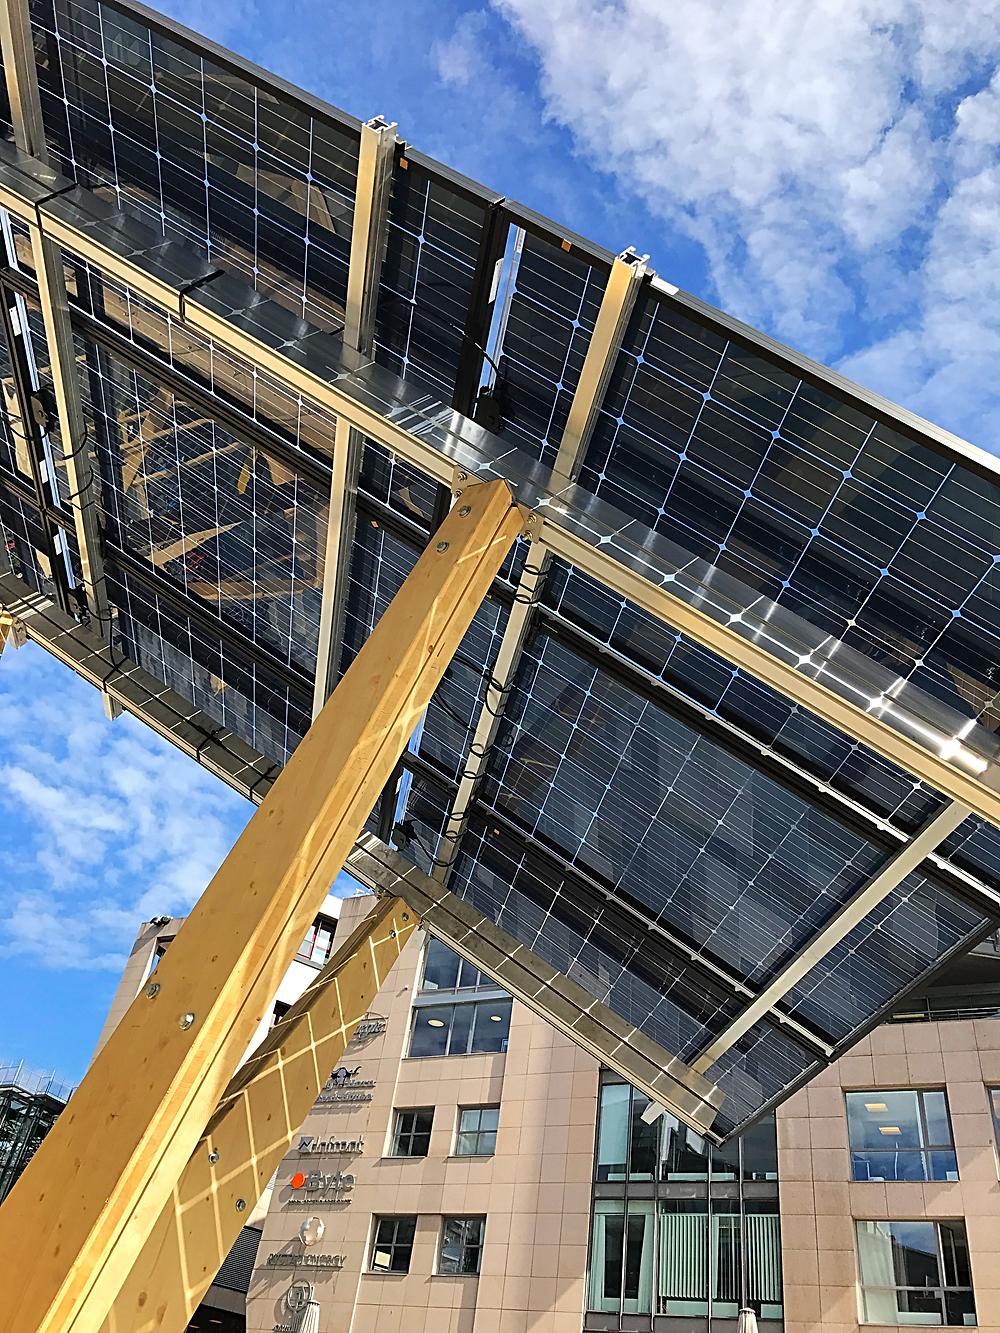 Solar charging at Aker Brygge